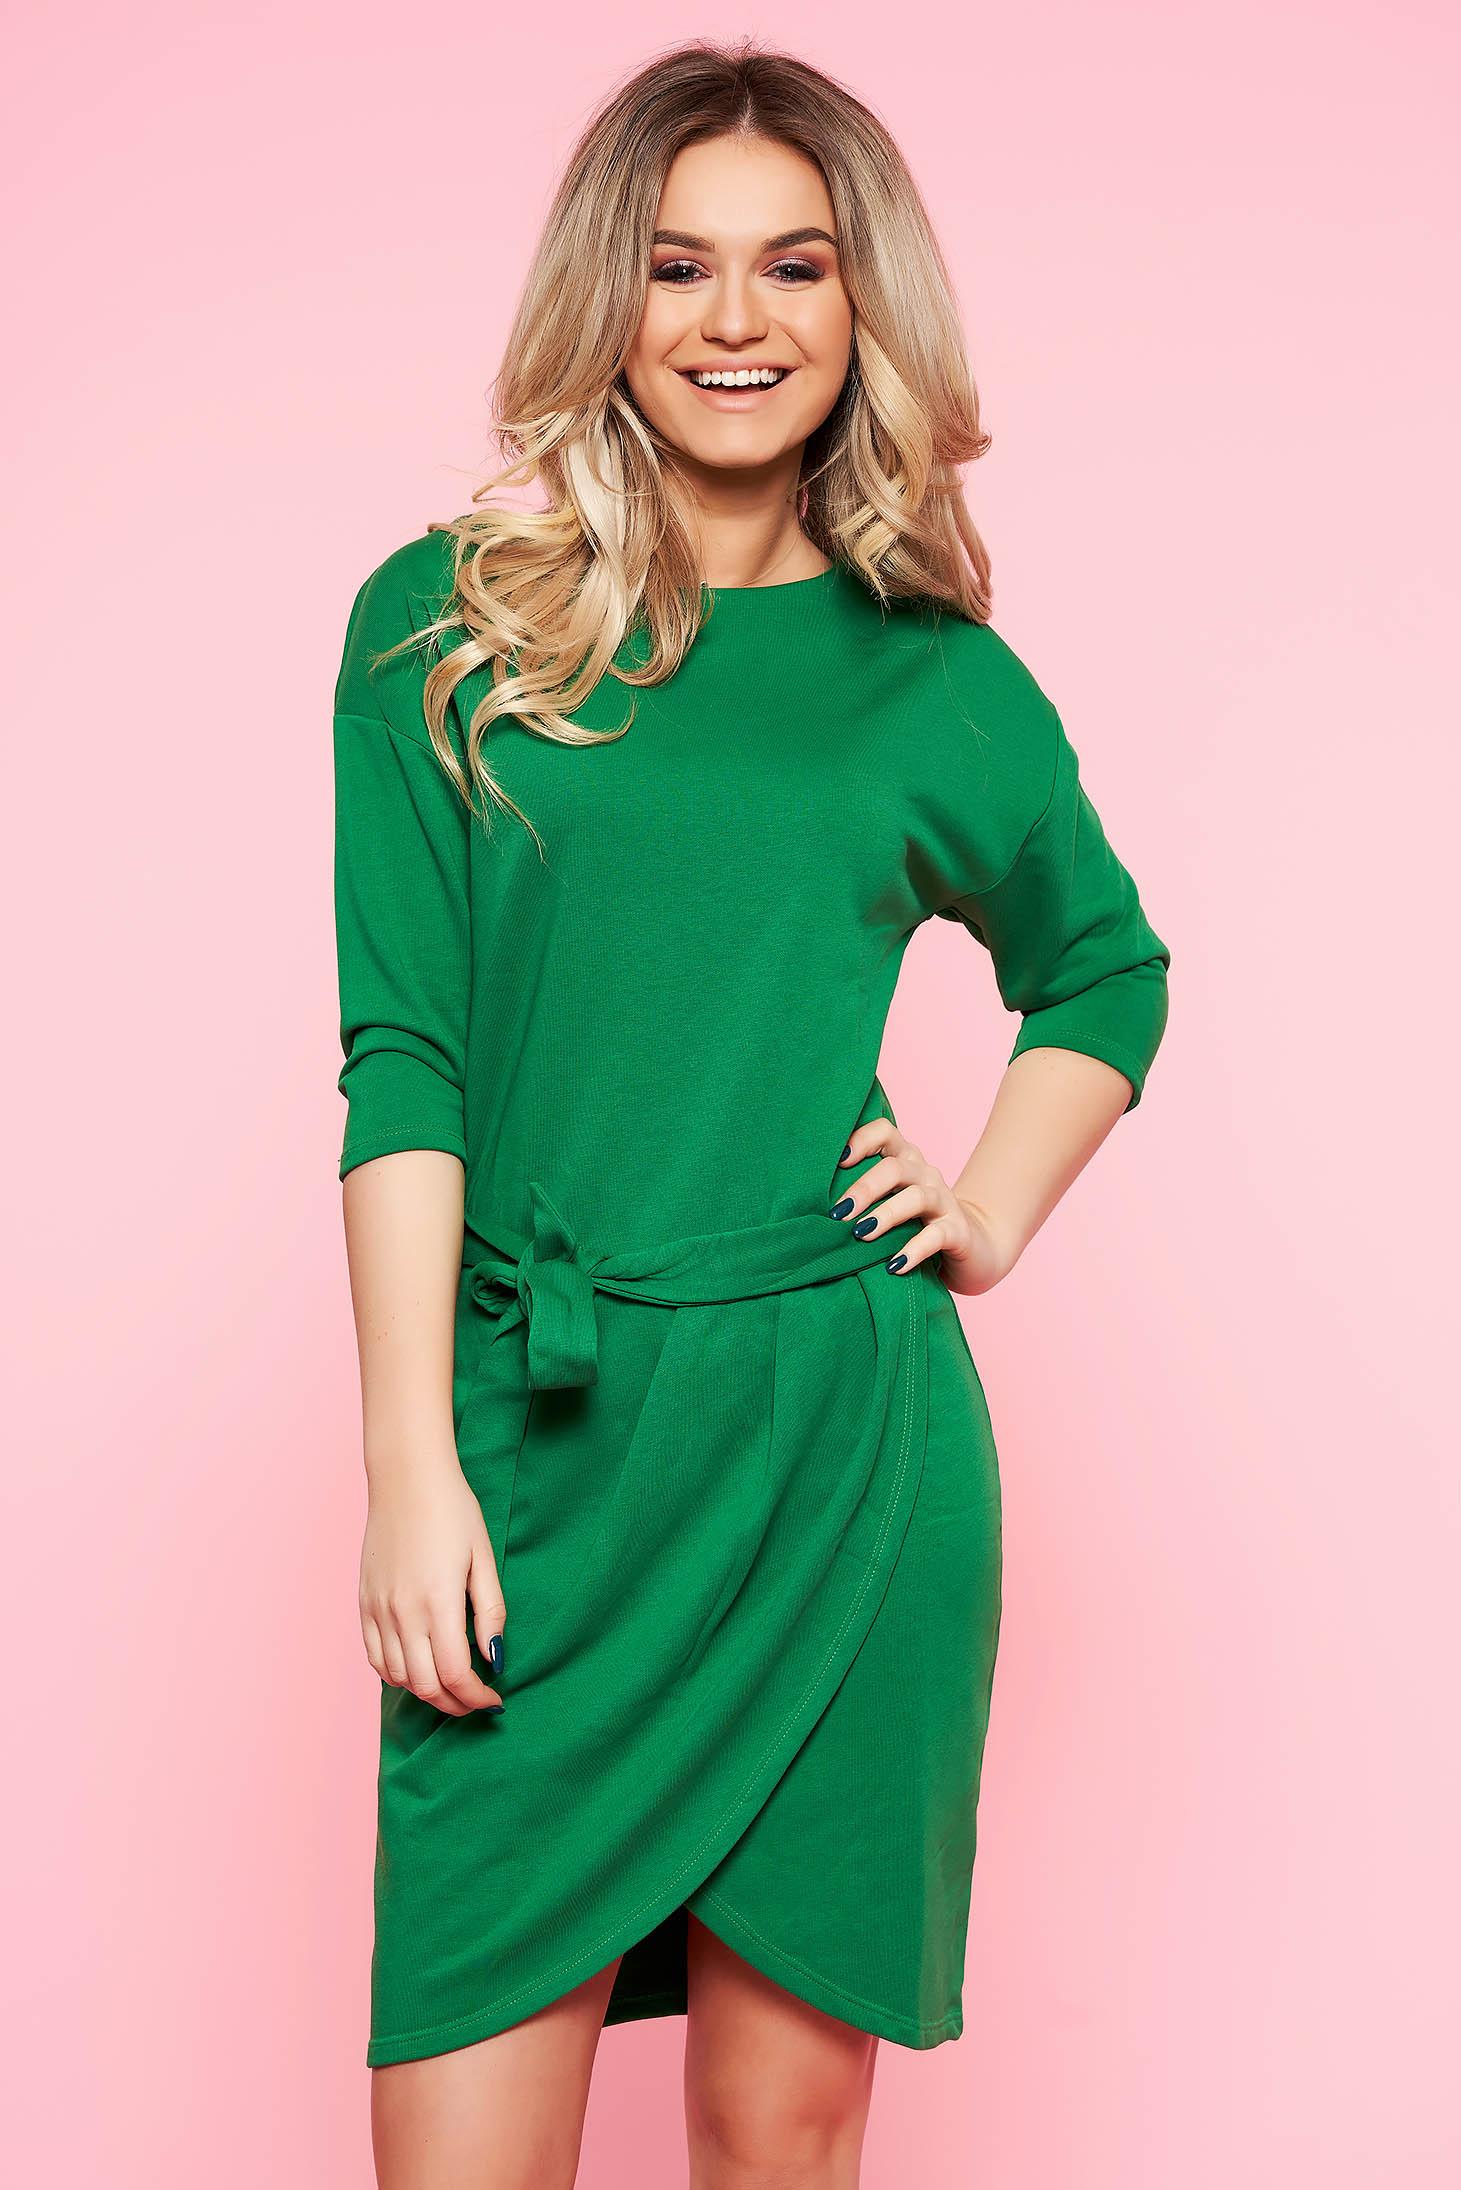 Rochie Top Secret verde casual cu un croi drept din bumbac usor elastic accesorizata cu cordon